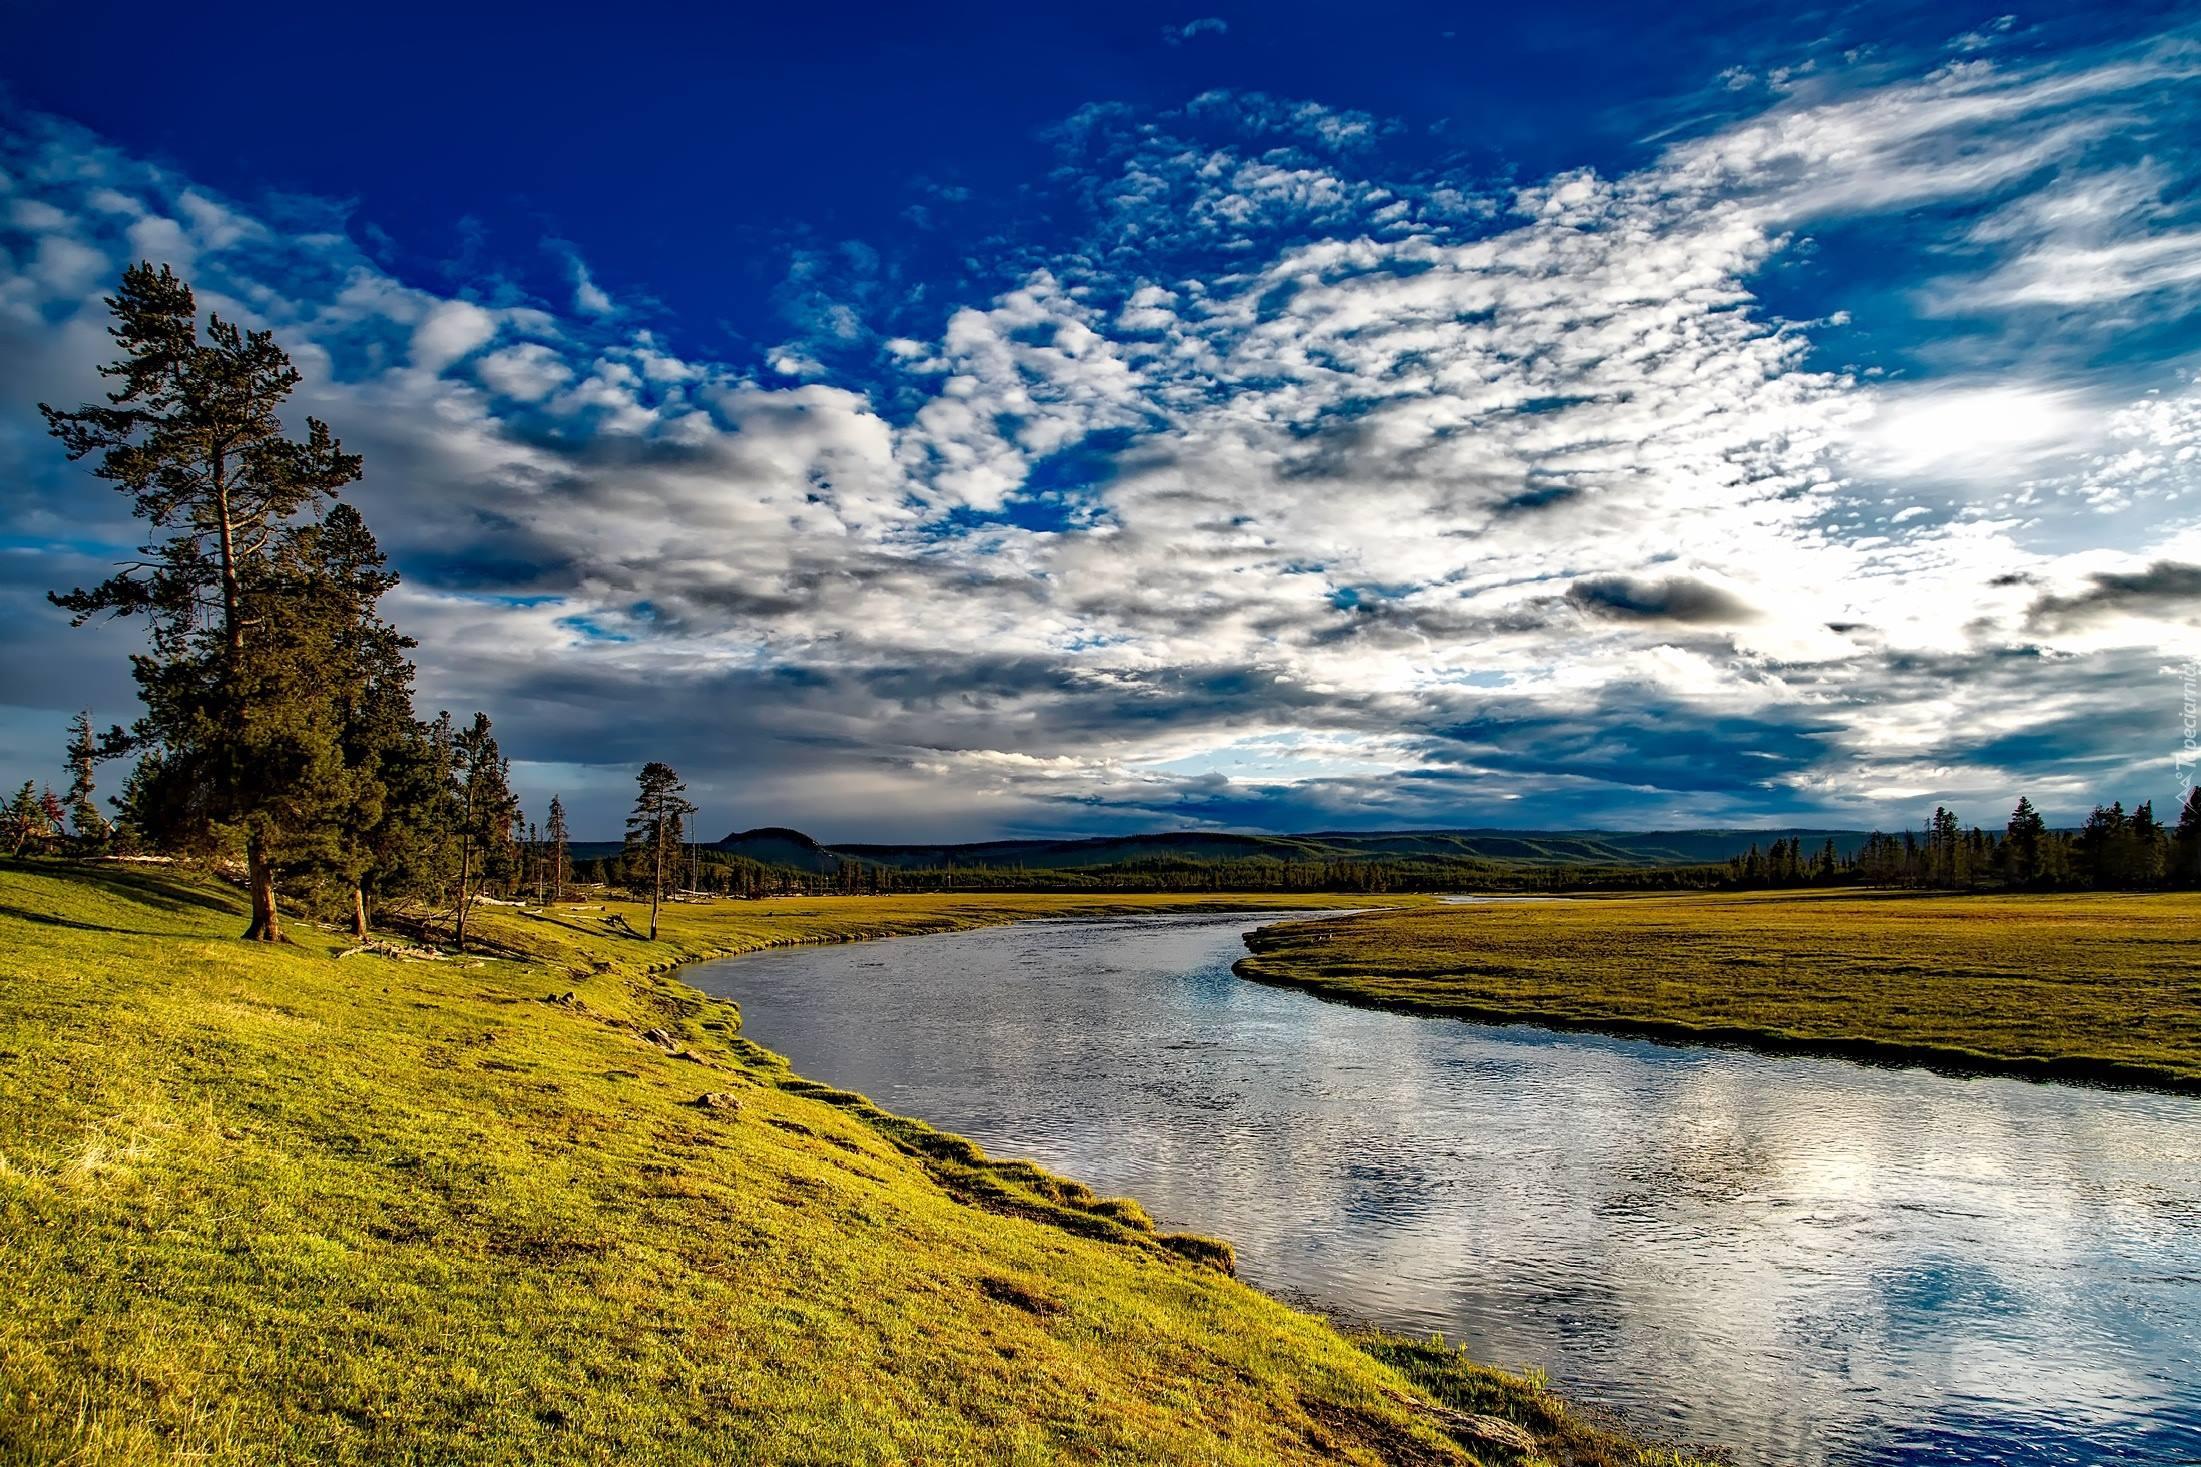 yellowstone national park firehole river plain trees